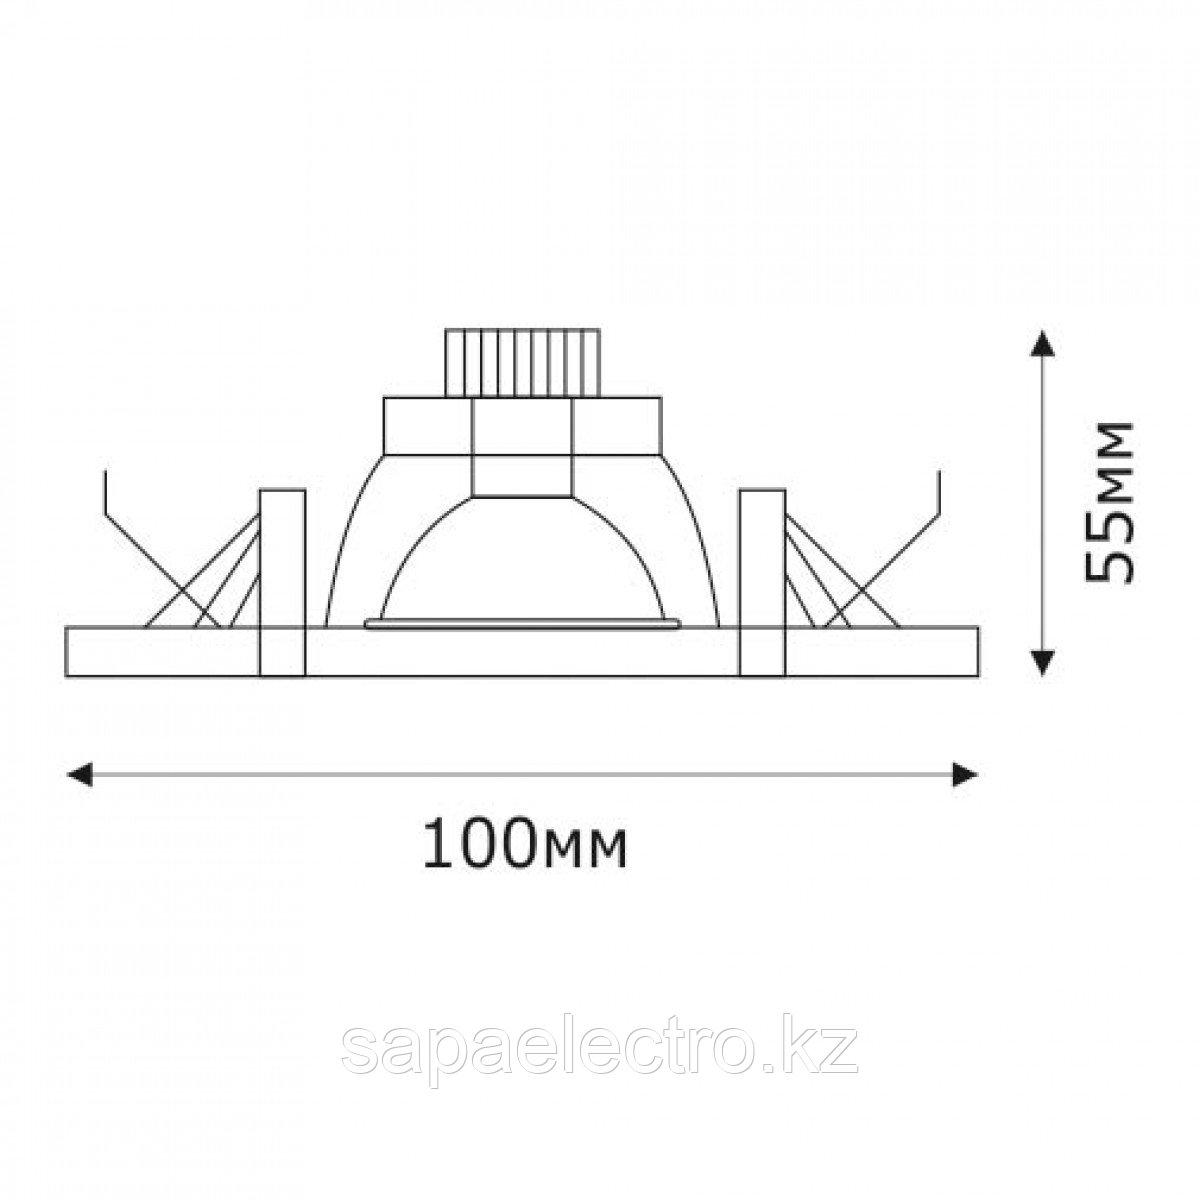 Спот LED QX4-346 ROUND 3W 5000K (TS) 60шт